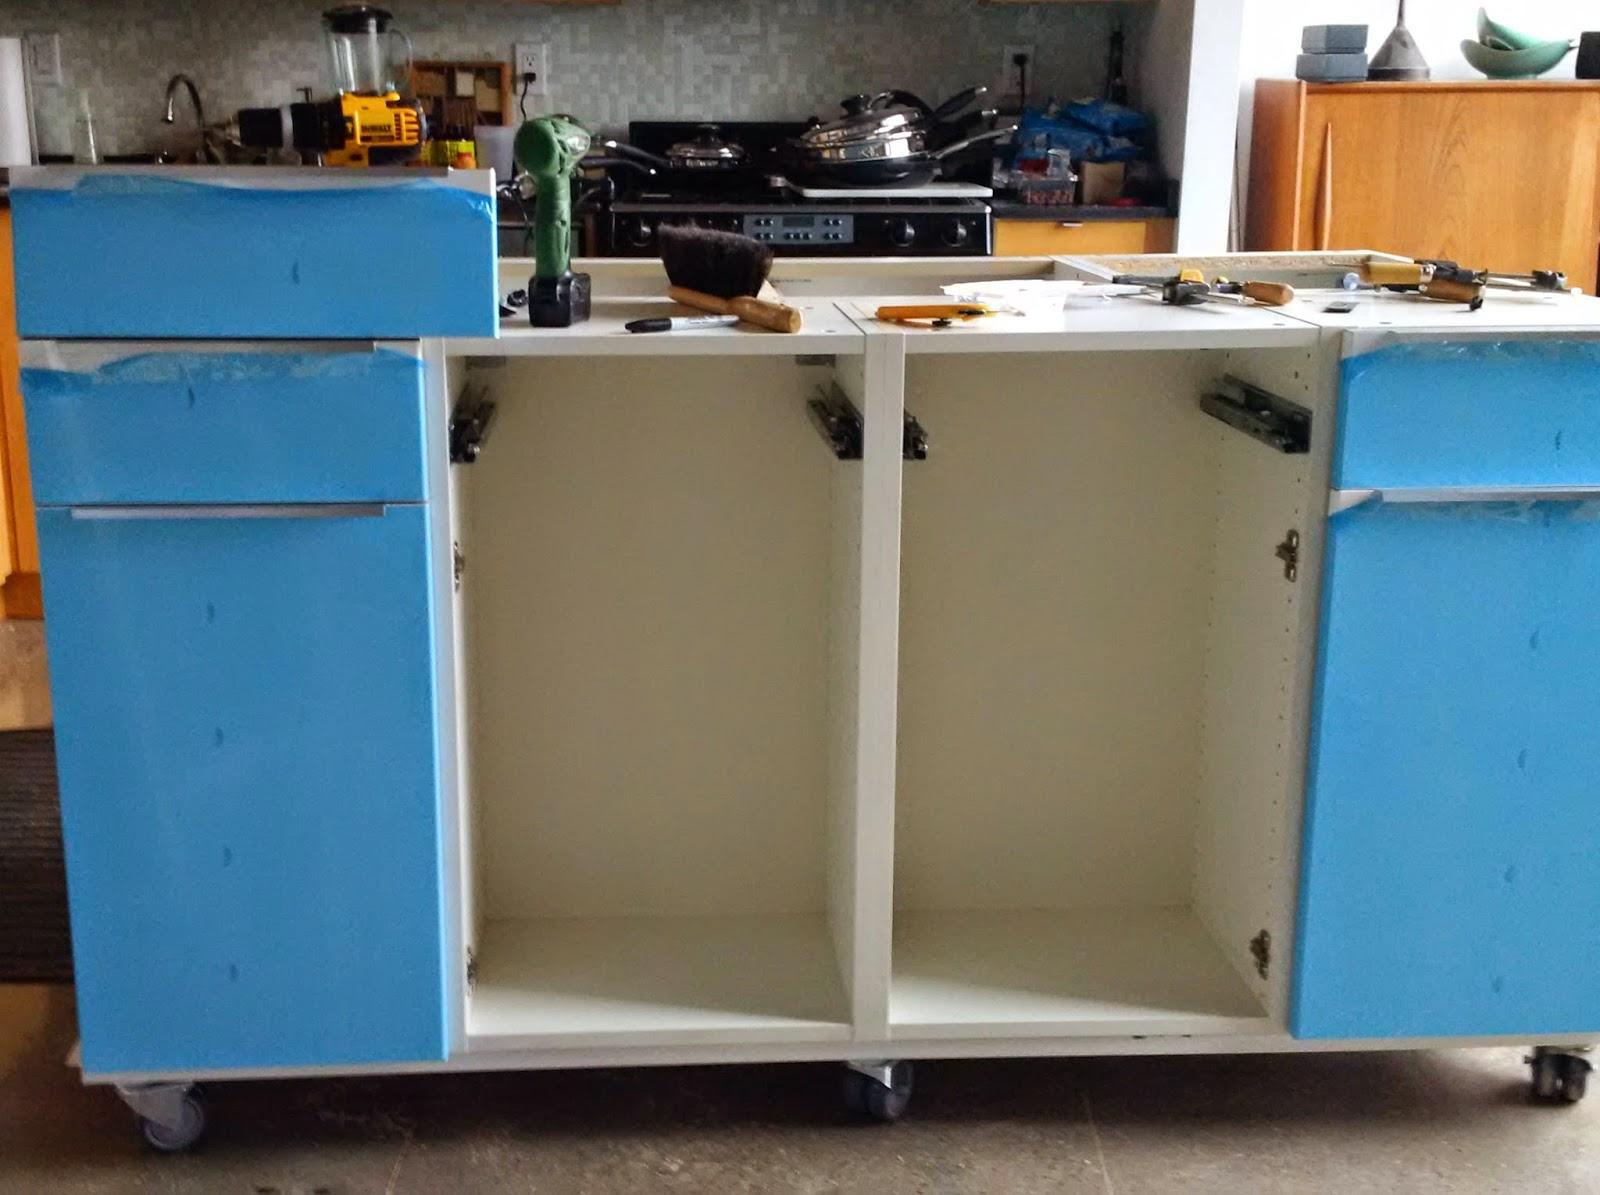 ikea kitchen island canada remodeling pictures studio kosnik good advice 43 on wheels